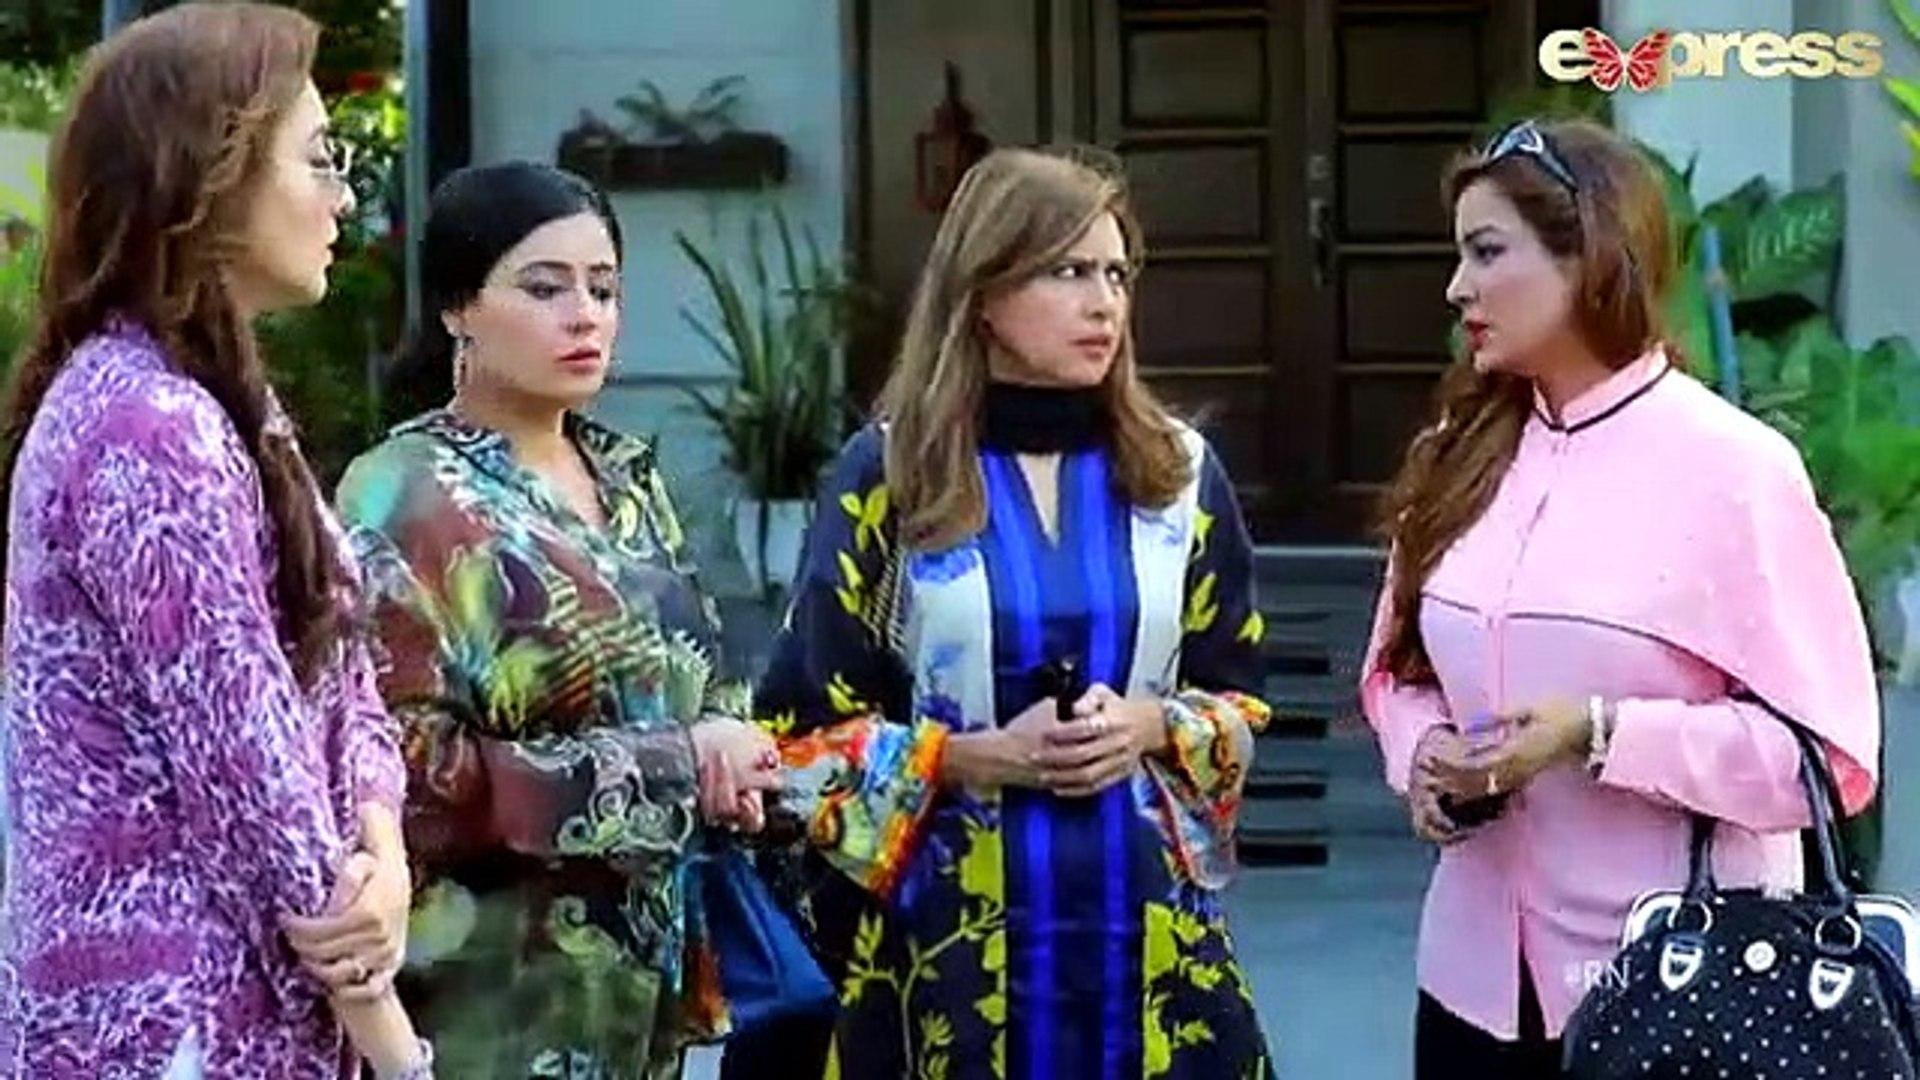 Rani Nokrani on Express Entertainment - Episode 11 Watch Online